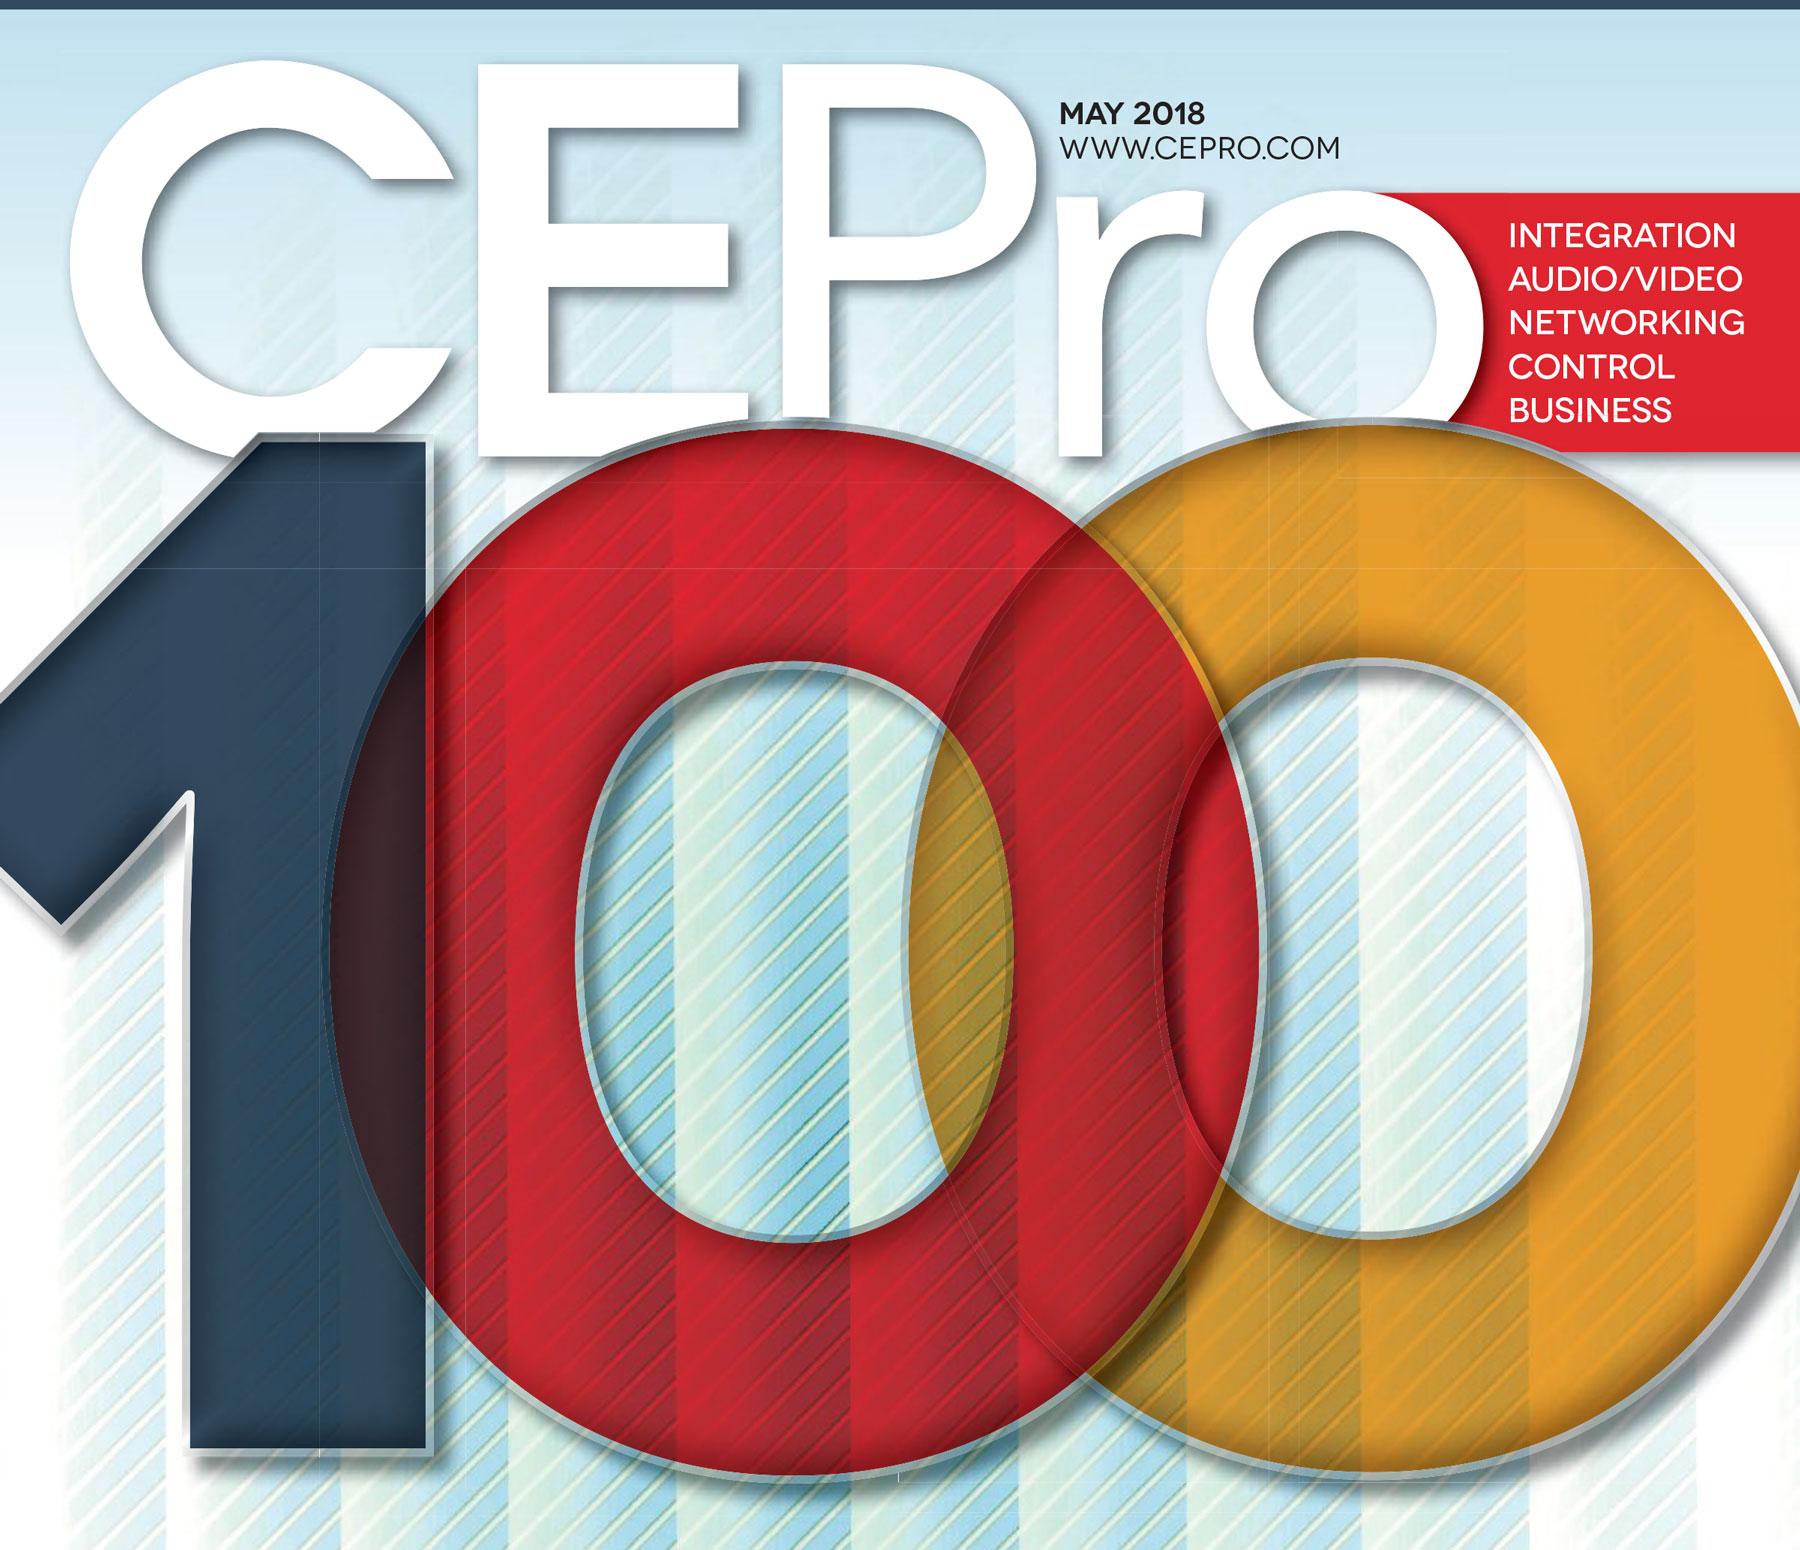 Lelch AV on CE Pro 19th Annual Top 100 List